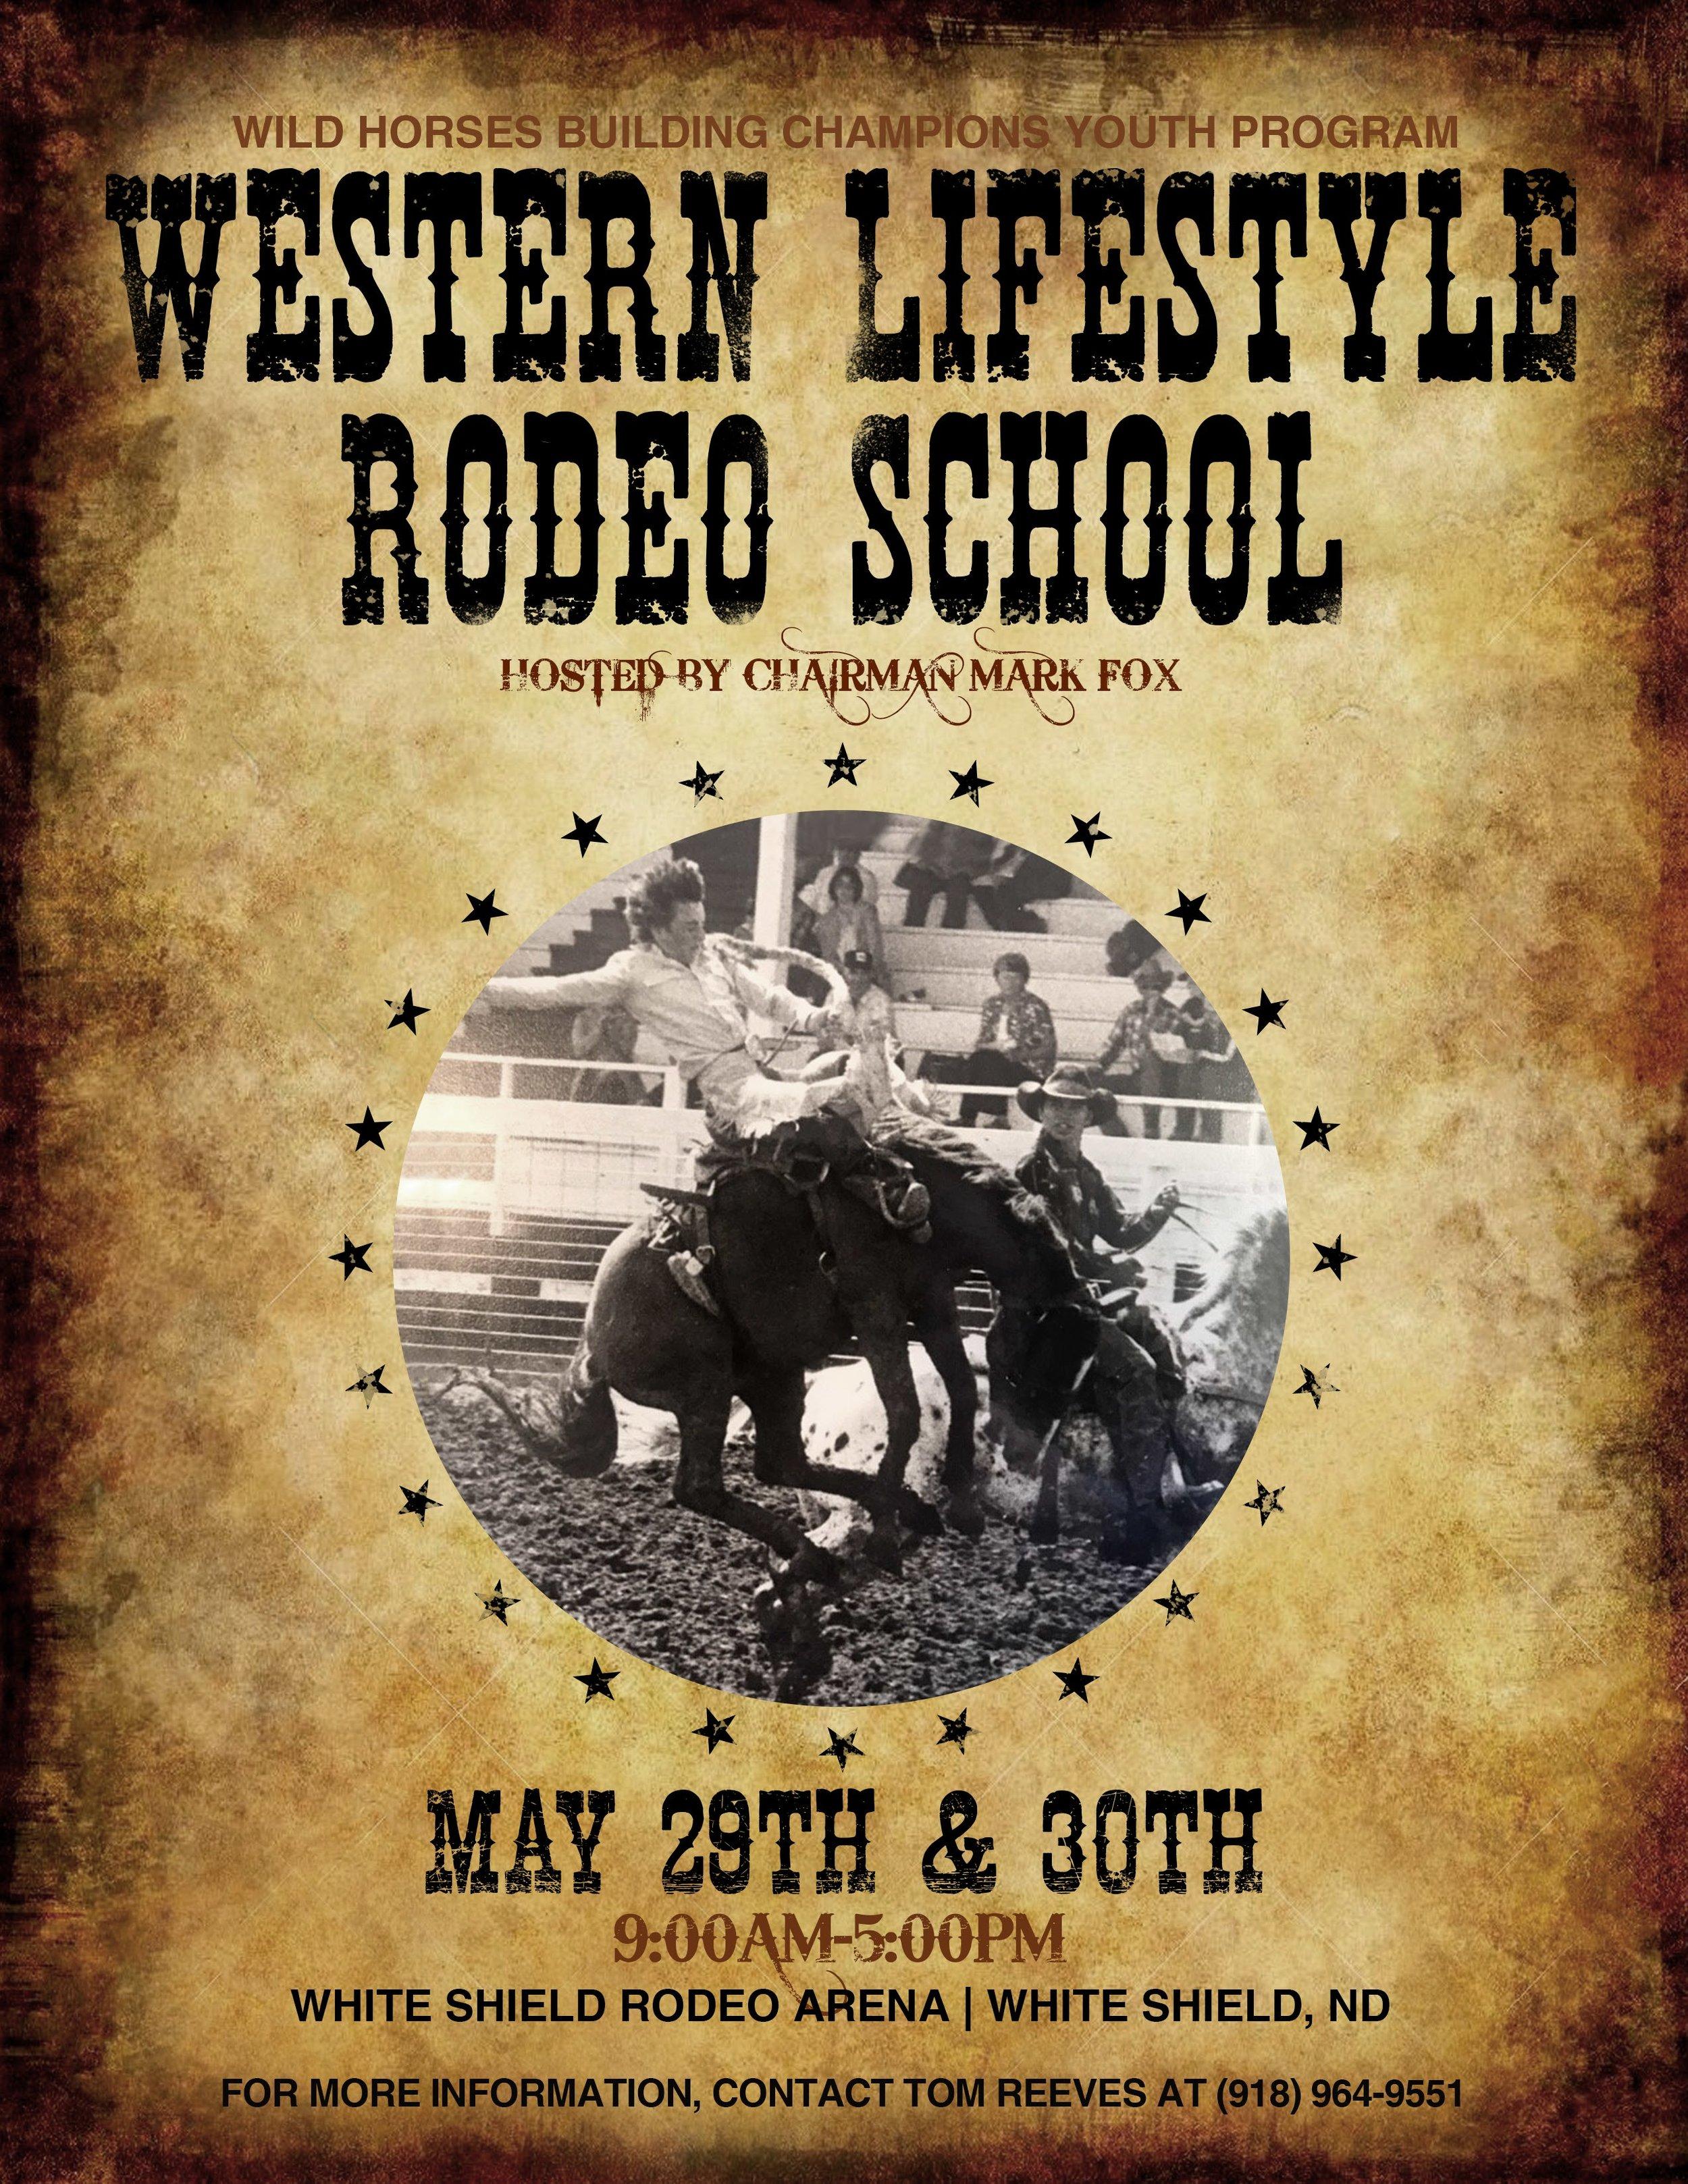 western-lifestyle-rodeo-school_may29-30.jpg